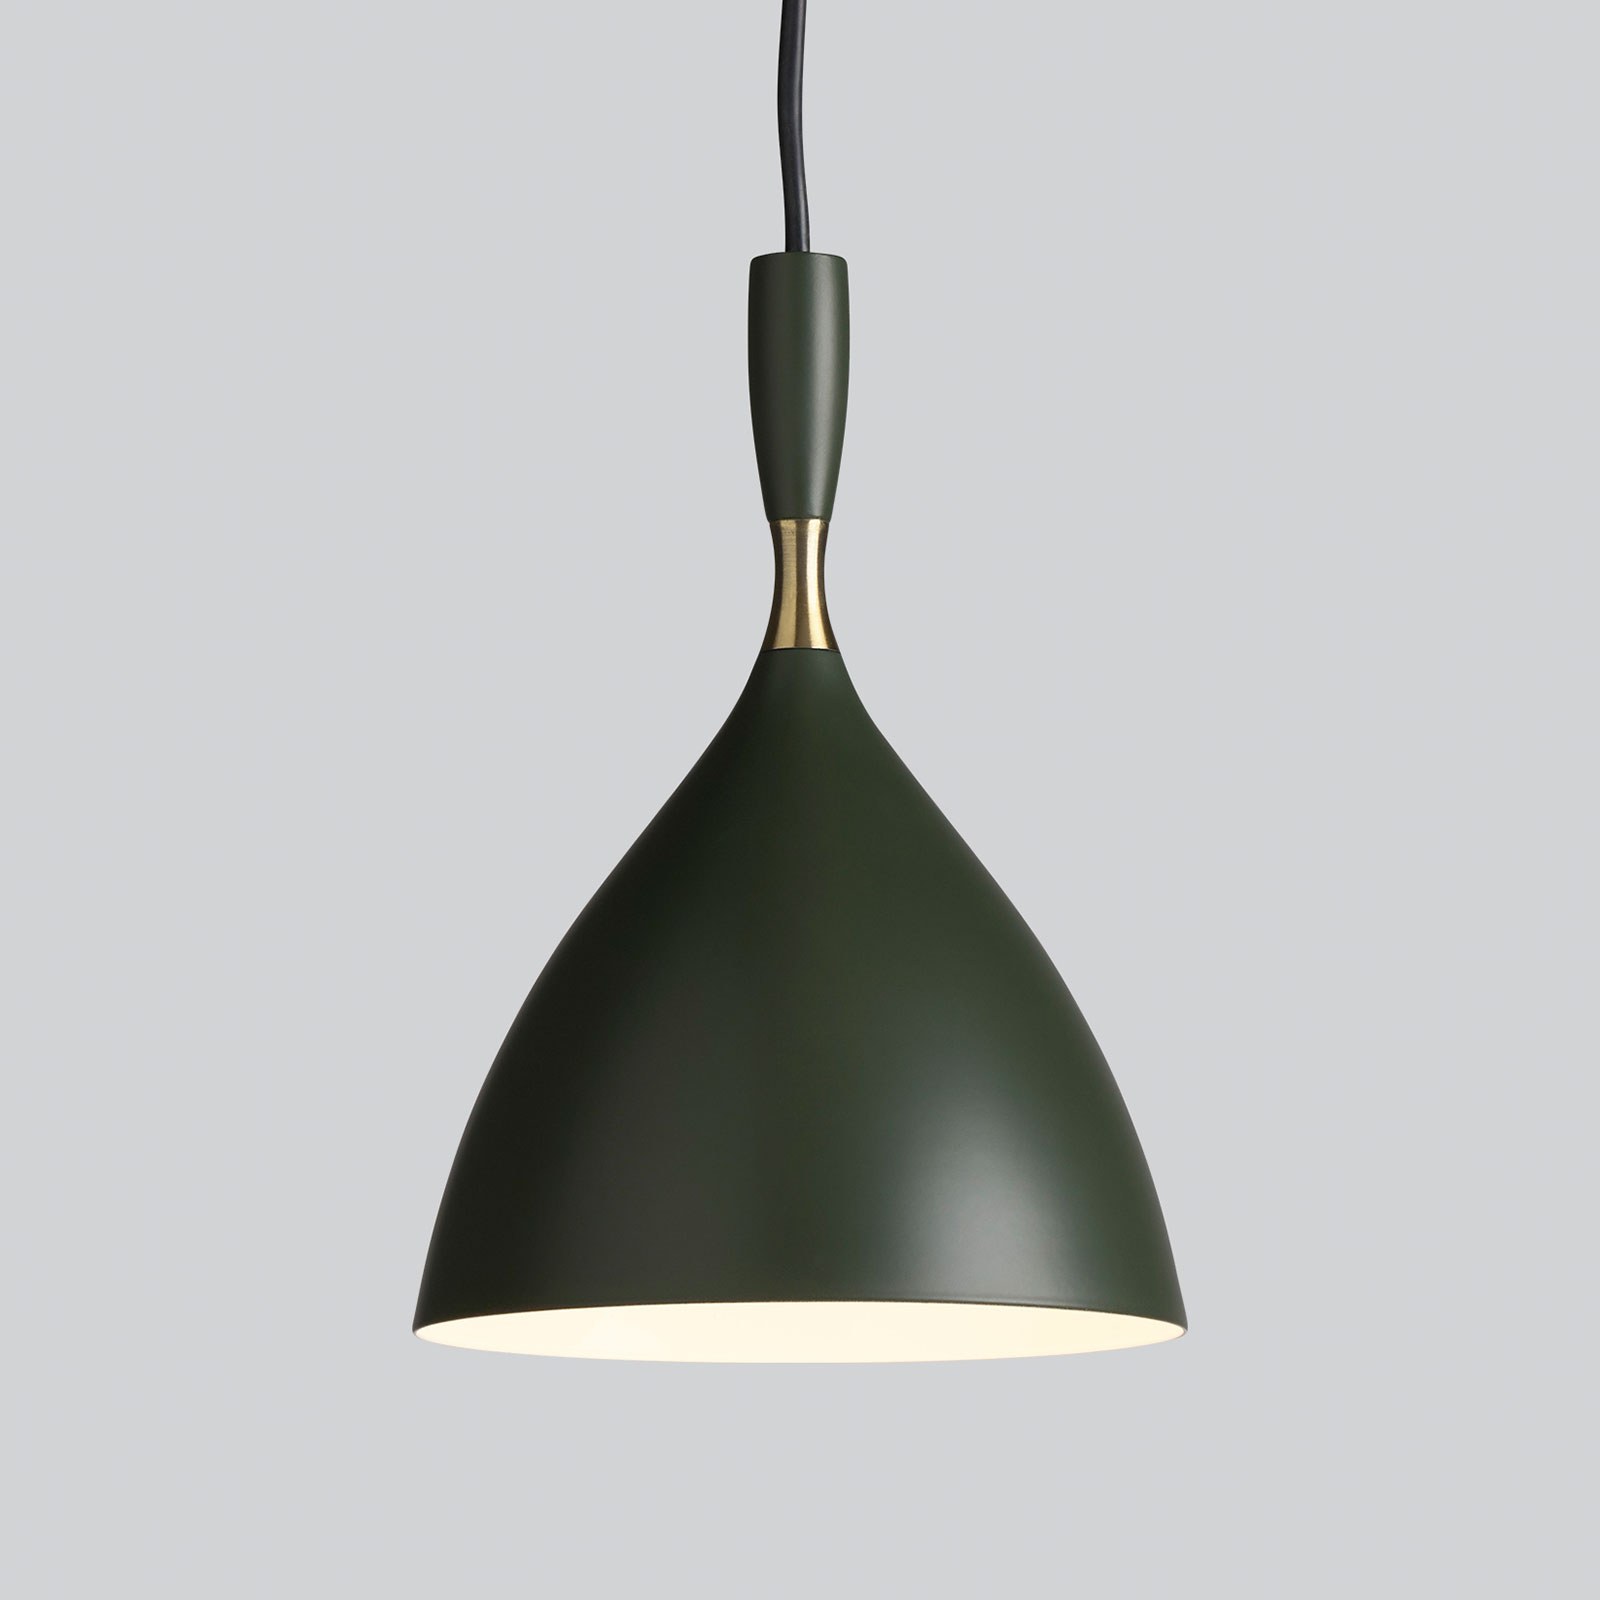 Northern Dokka lampada a sospensione verde scuro